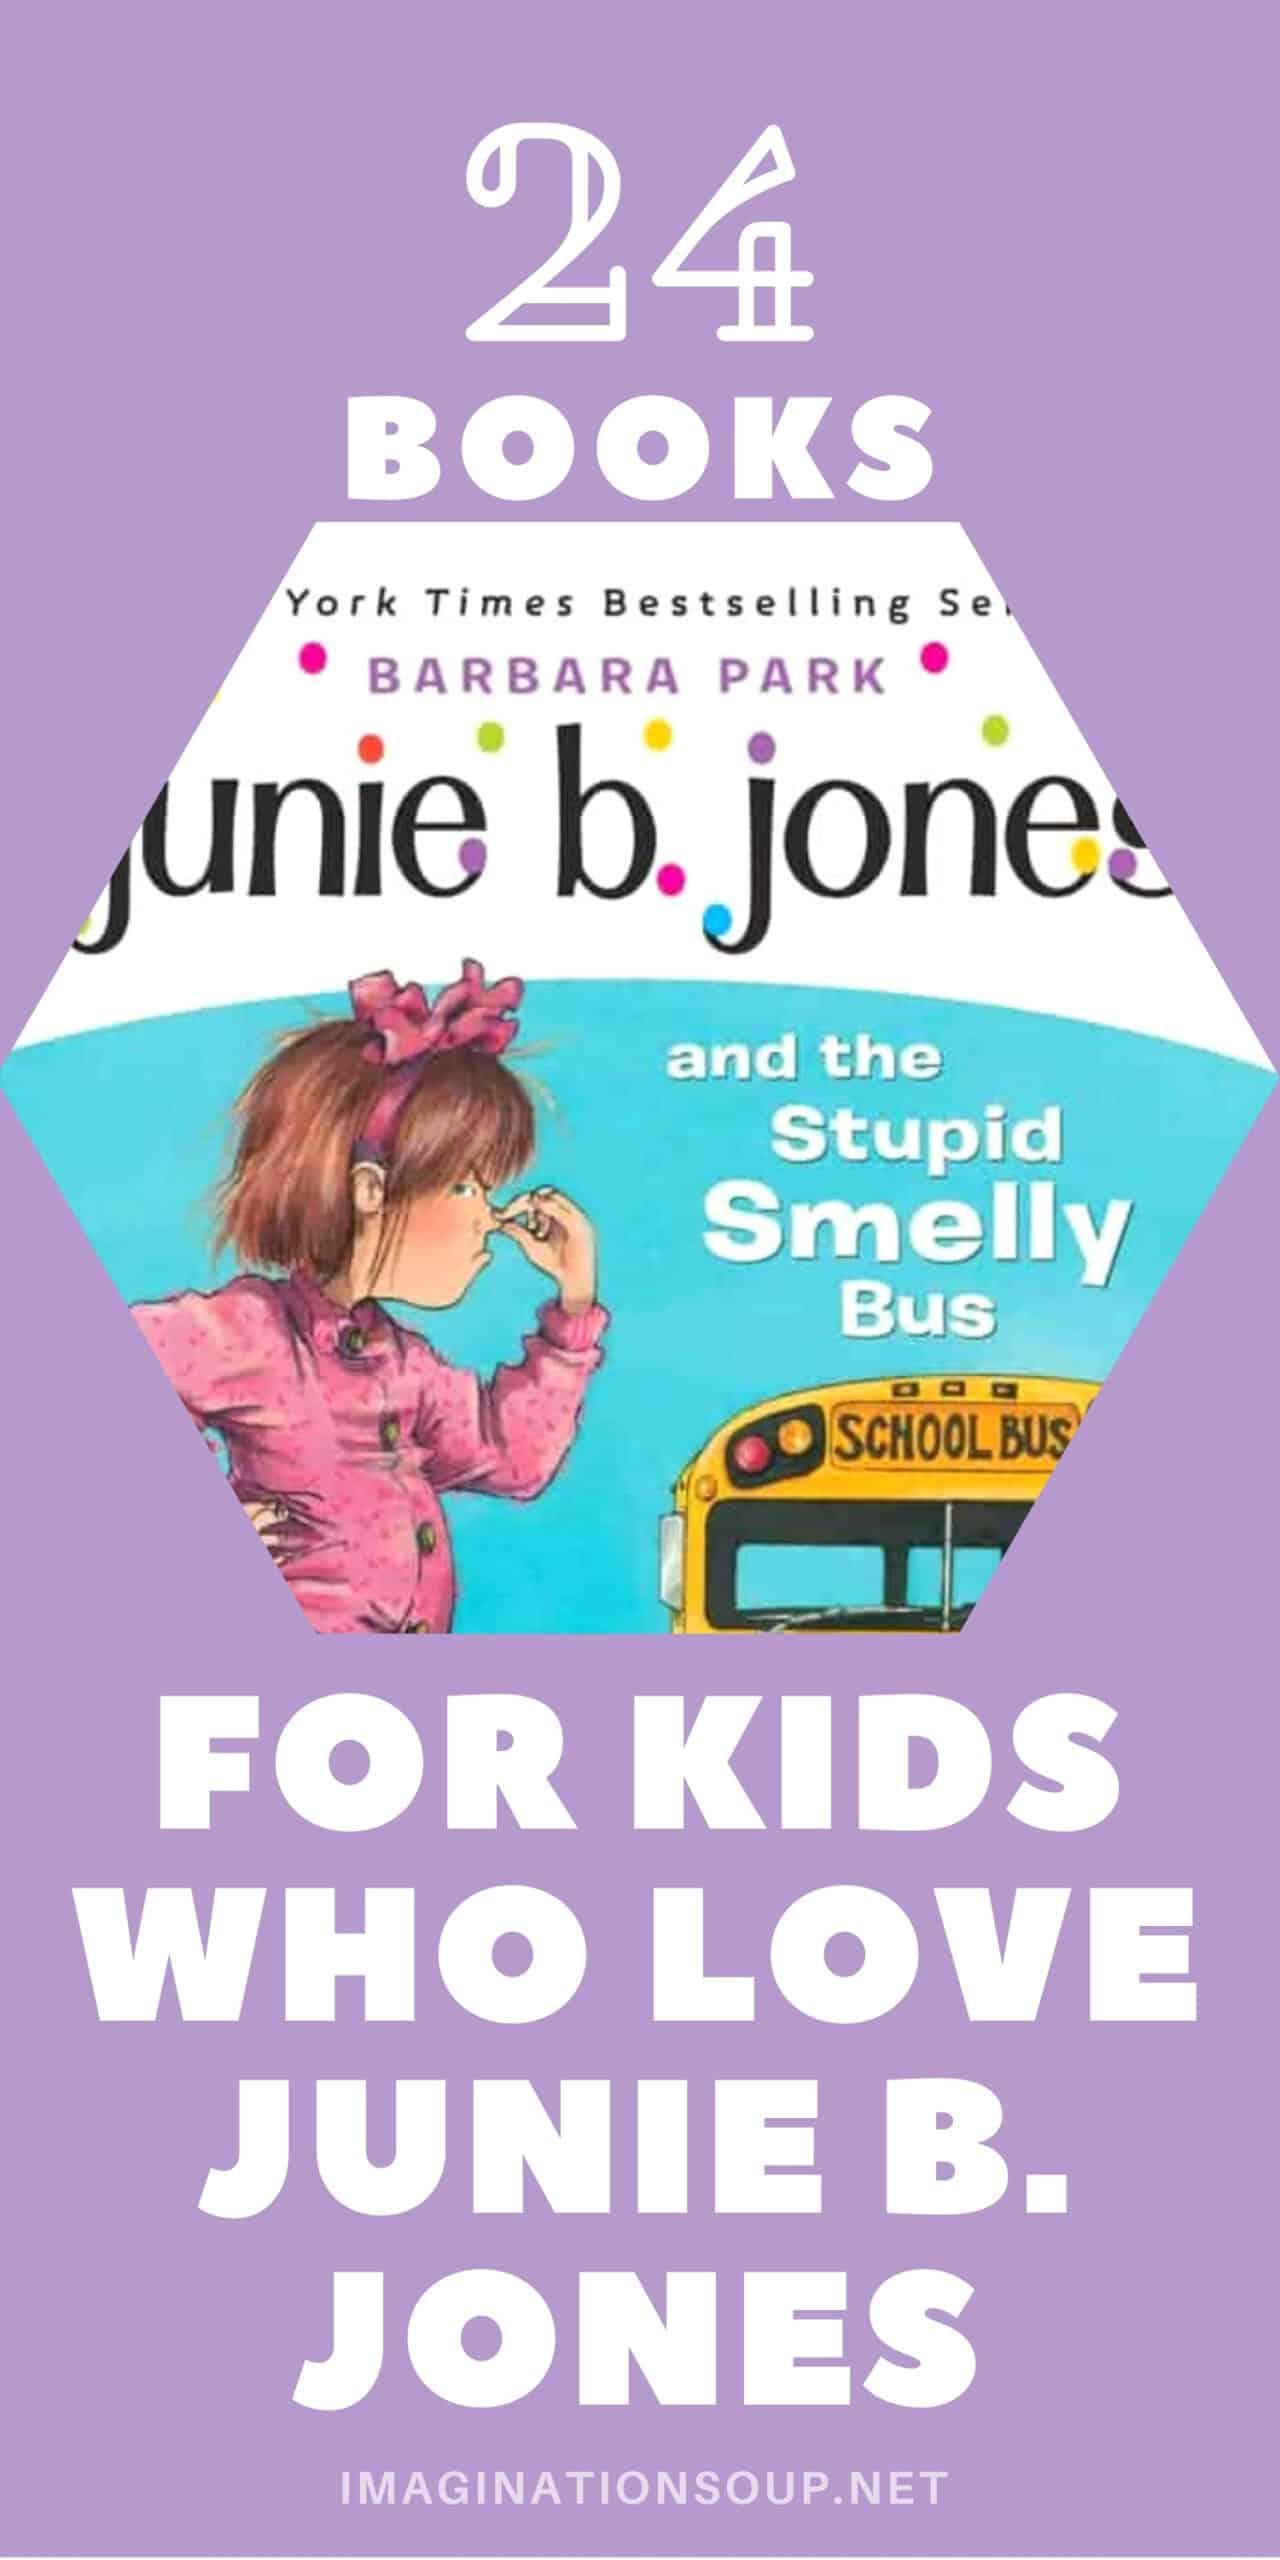 24 books for kids who love junie b jones